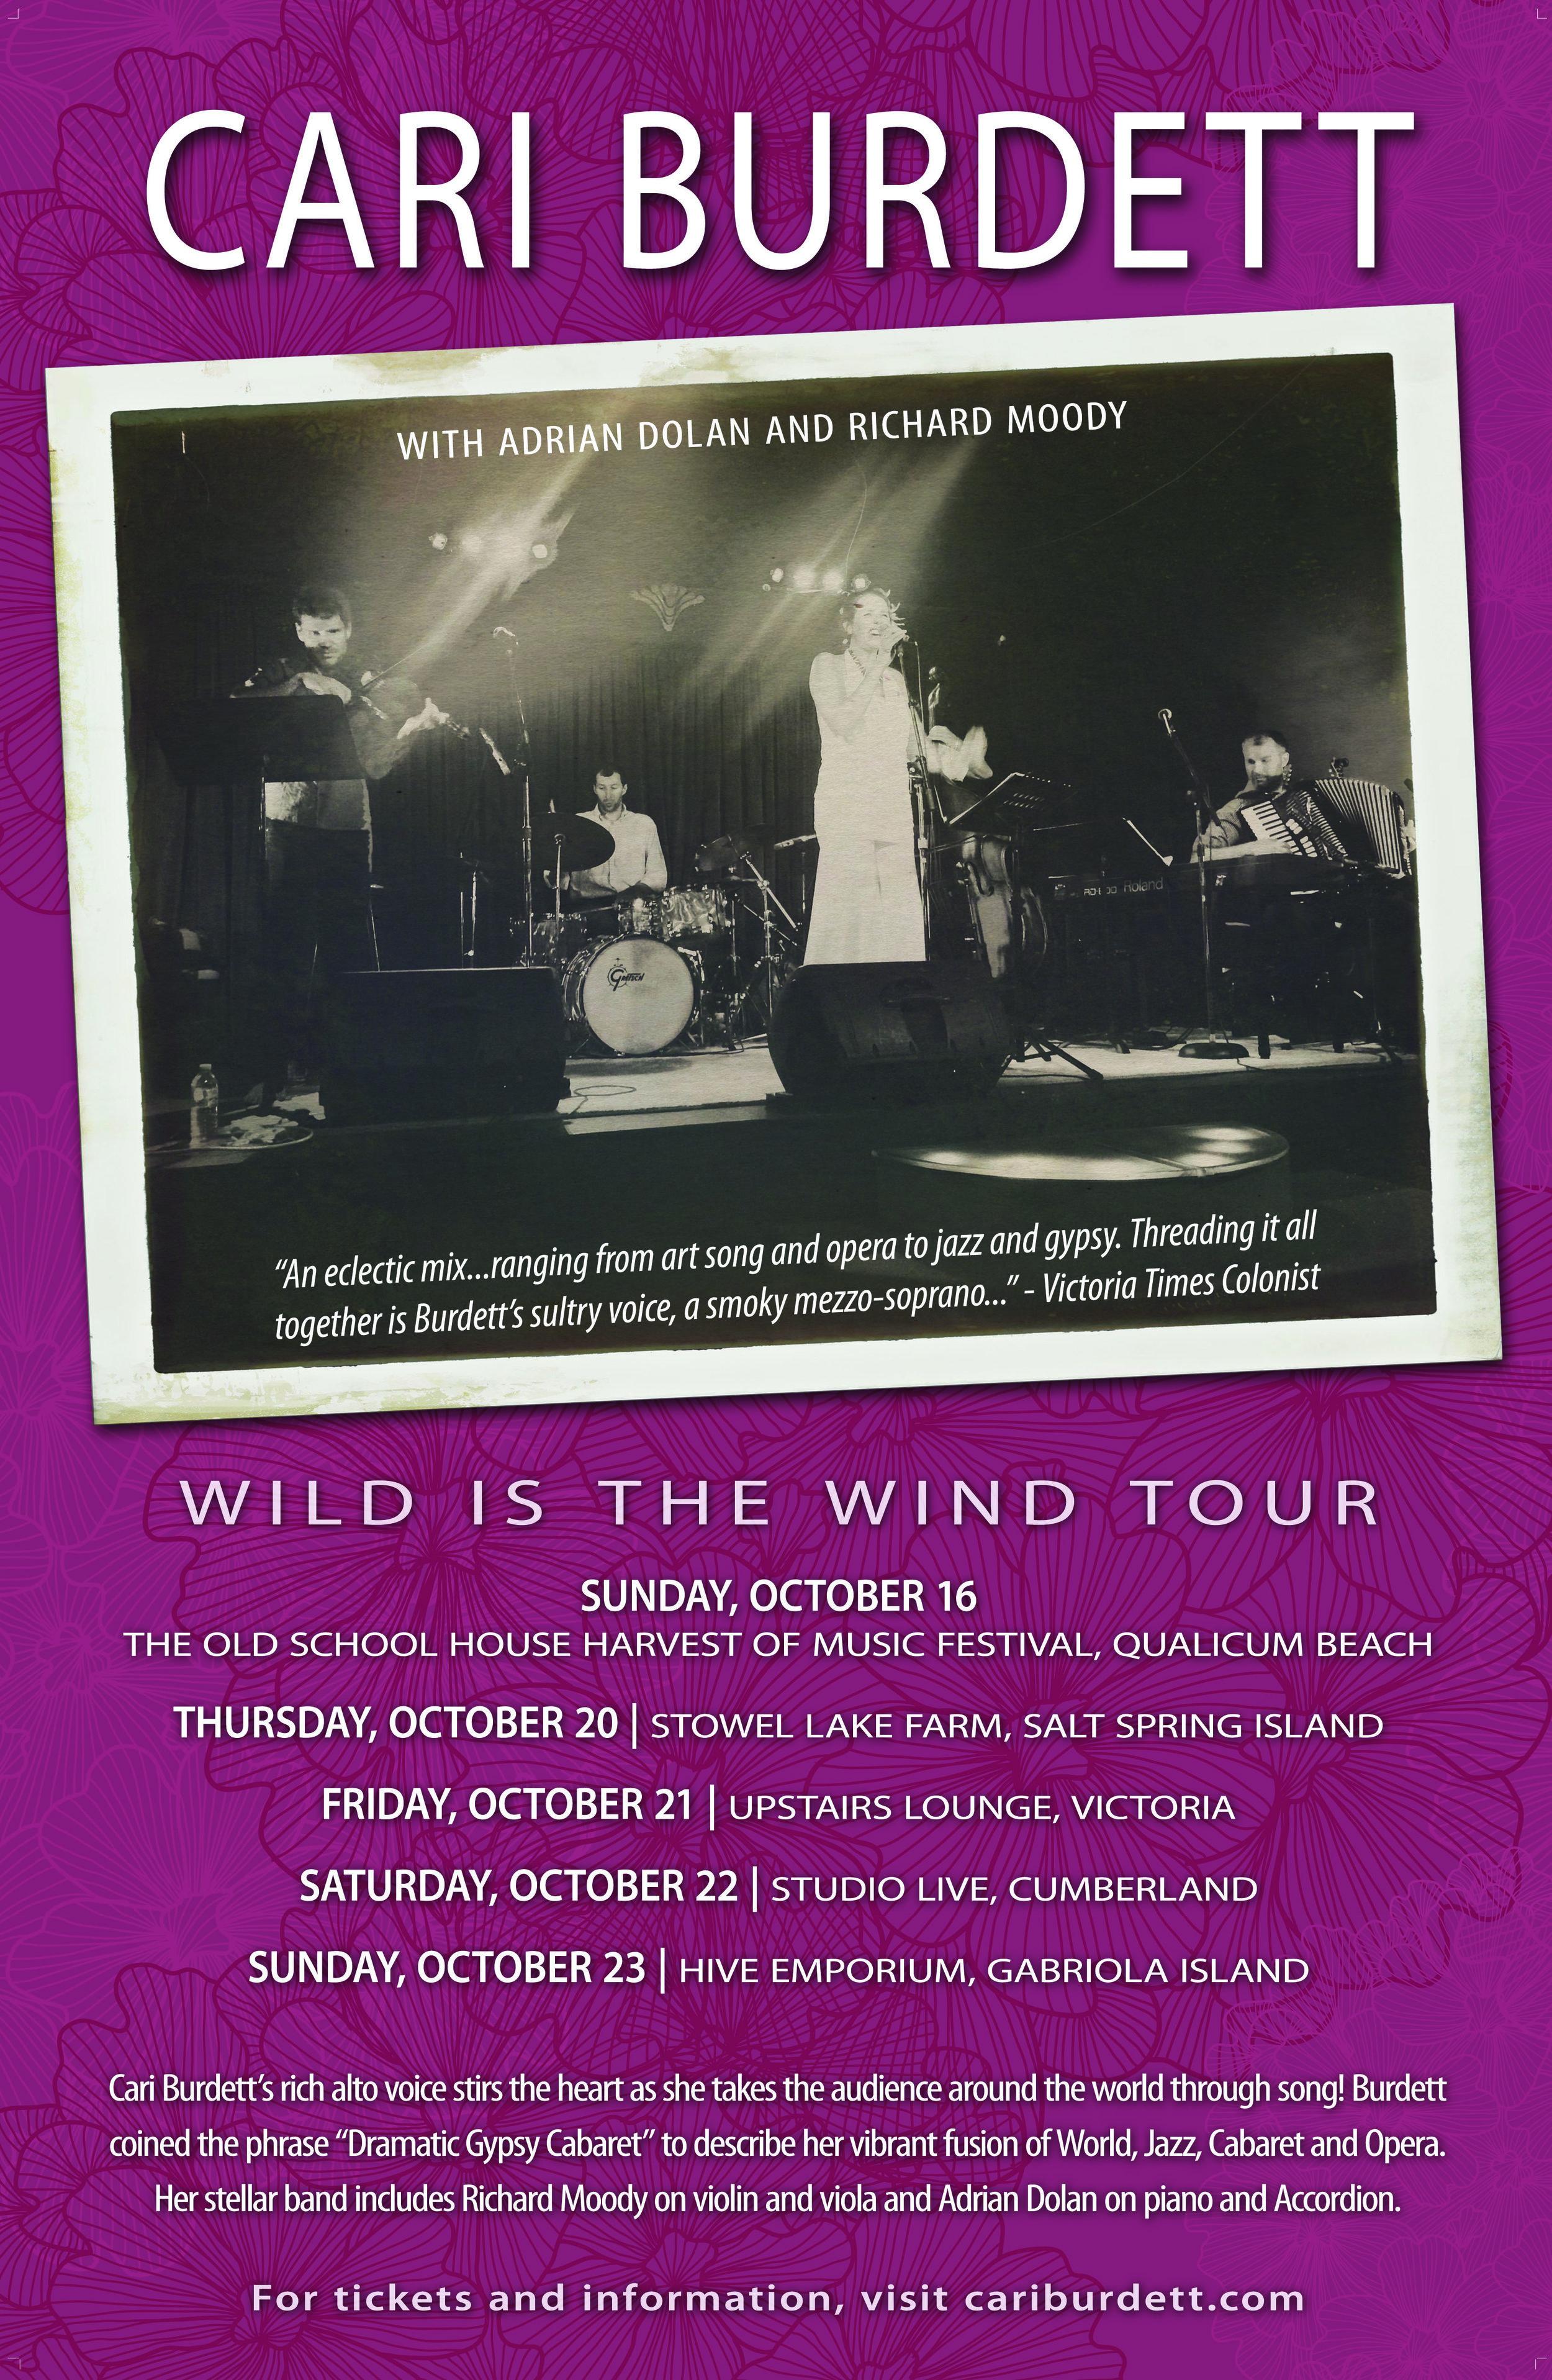 A 5 show tour across Vancouver Island!